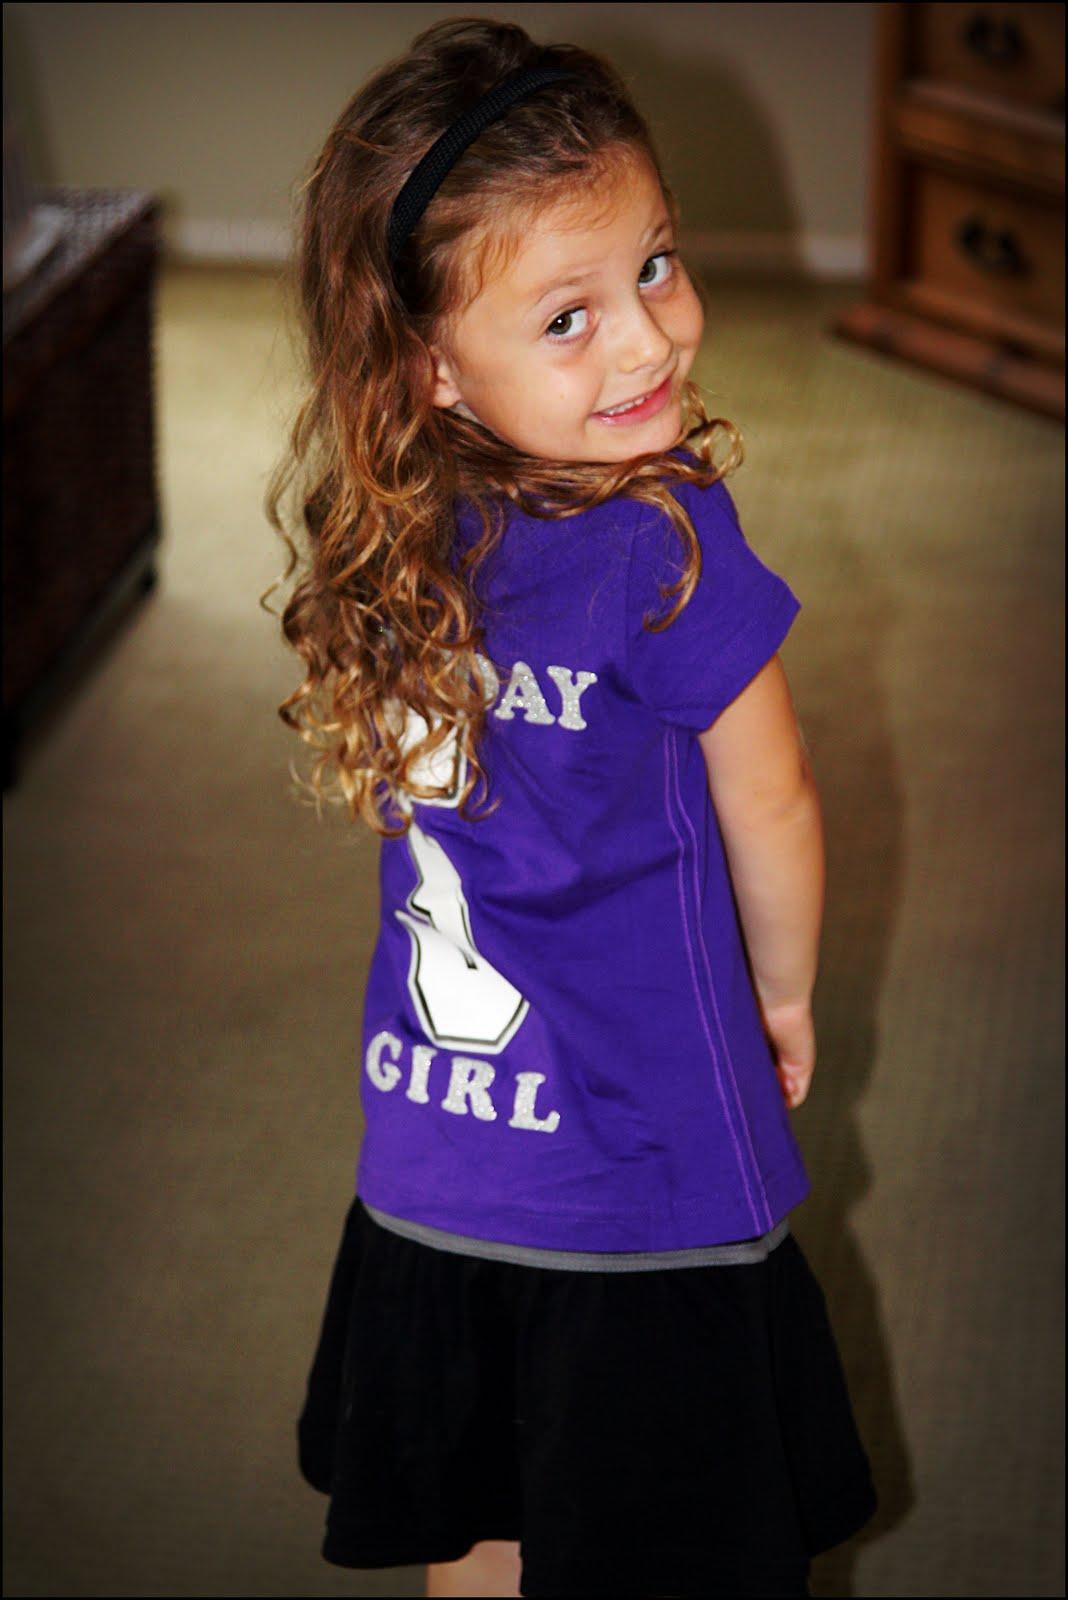 5 Year Old Girl Swimsuit